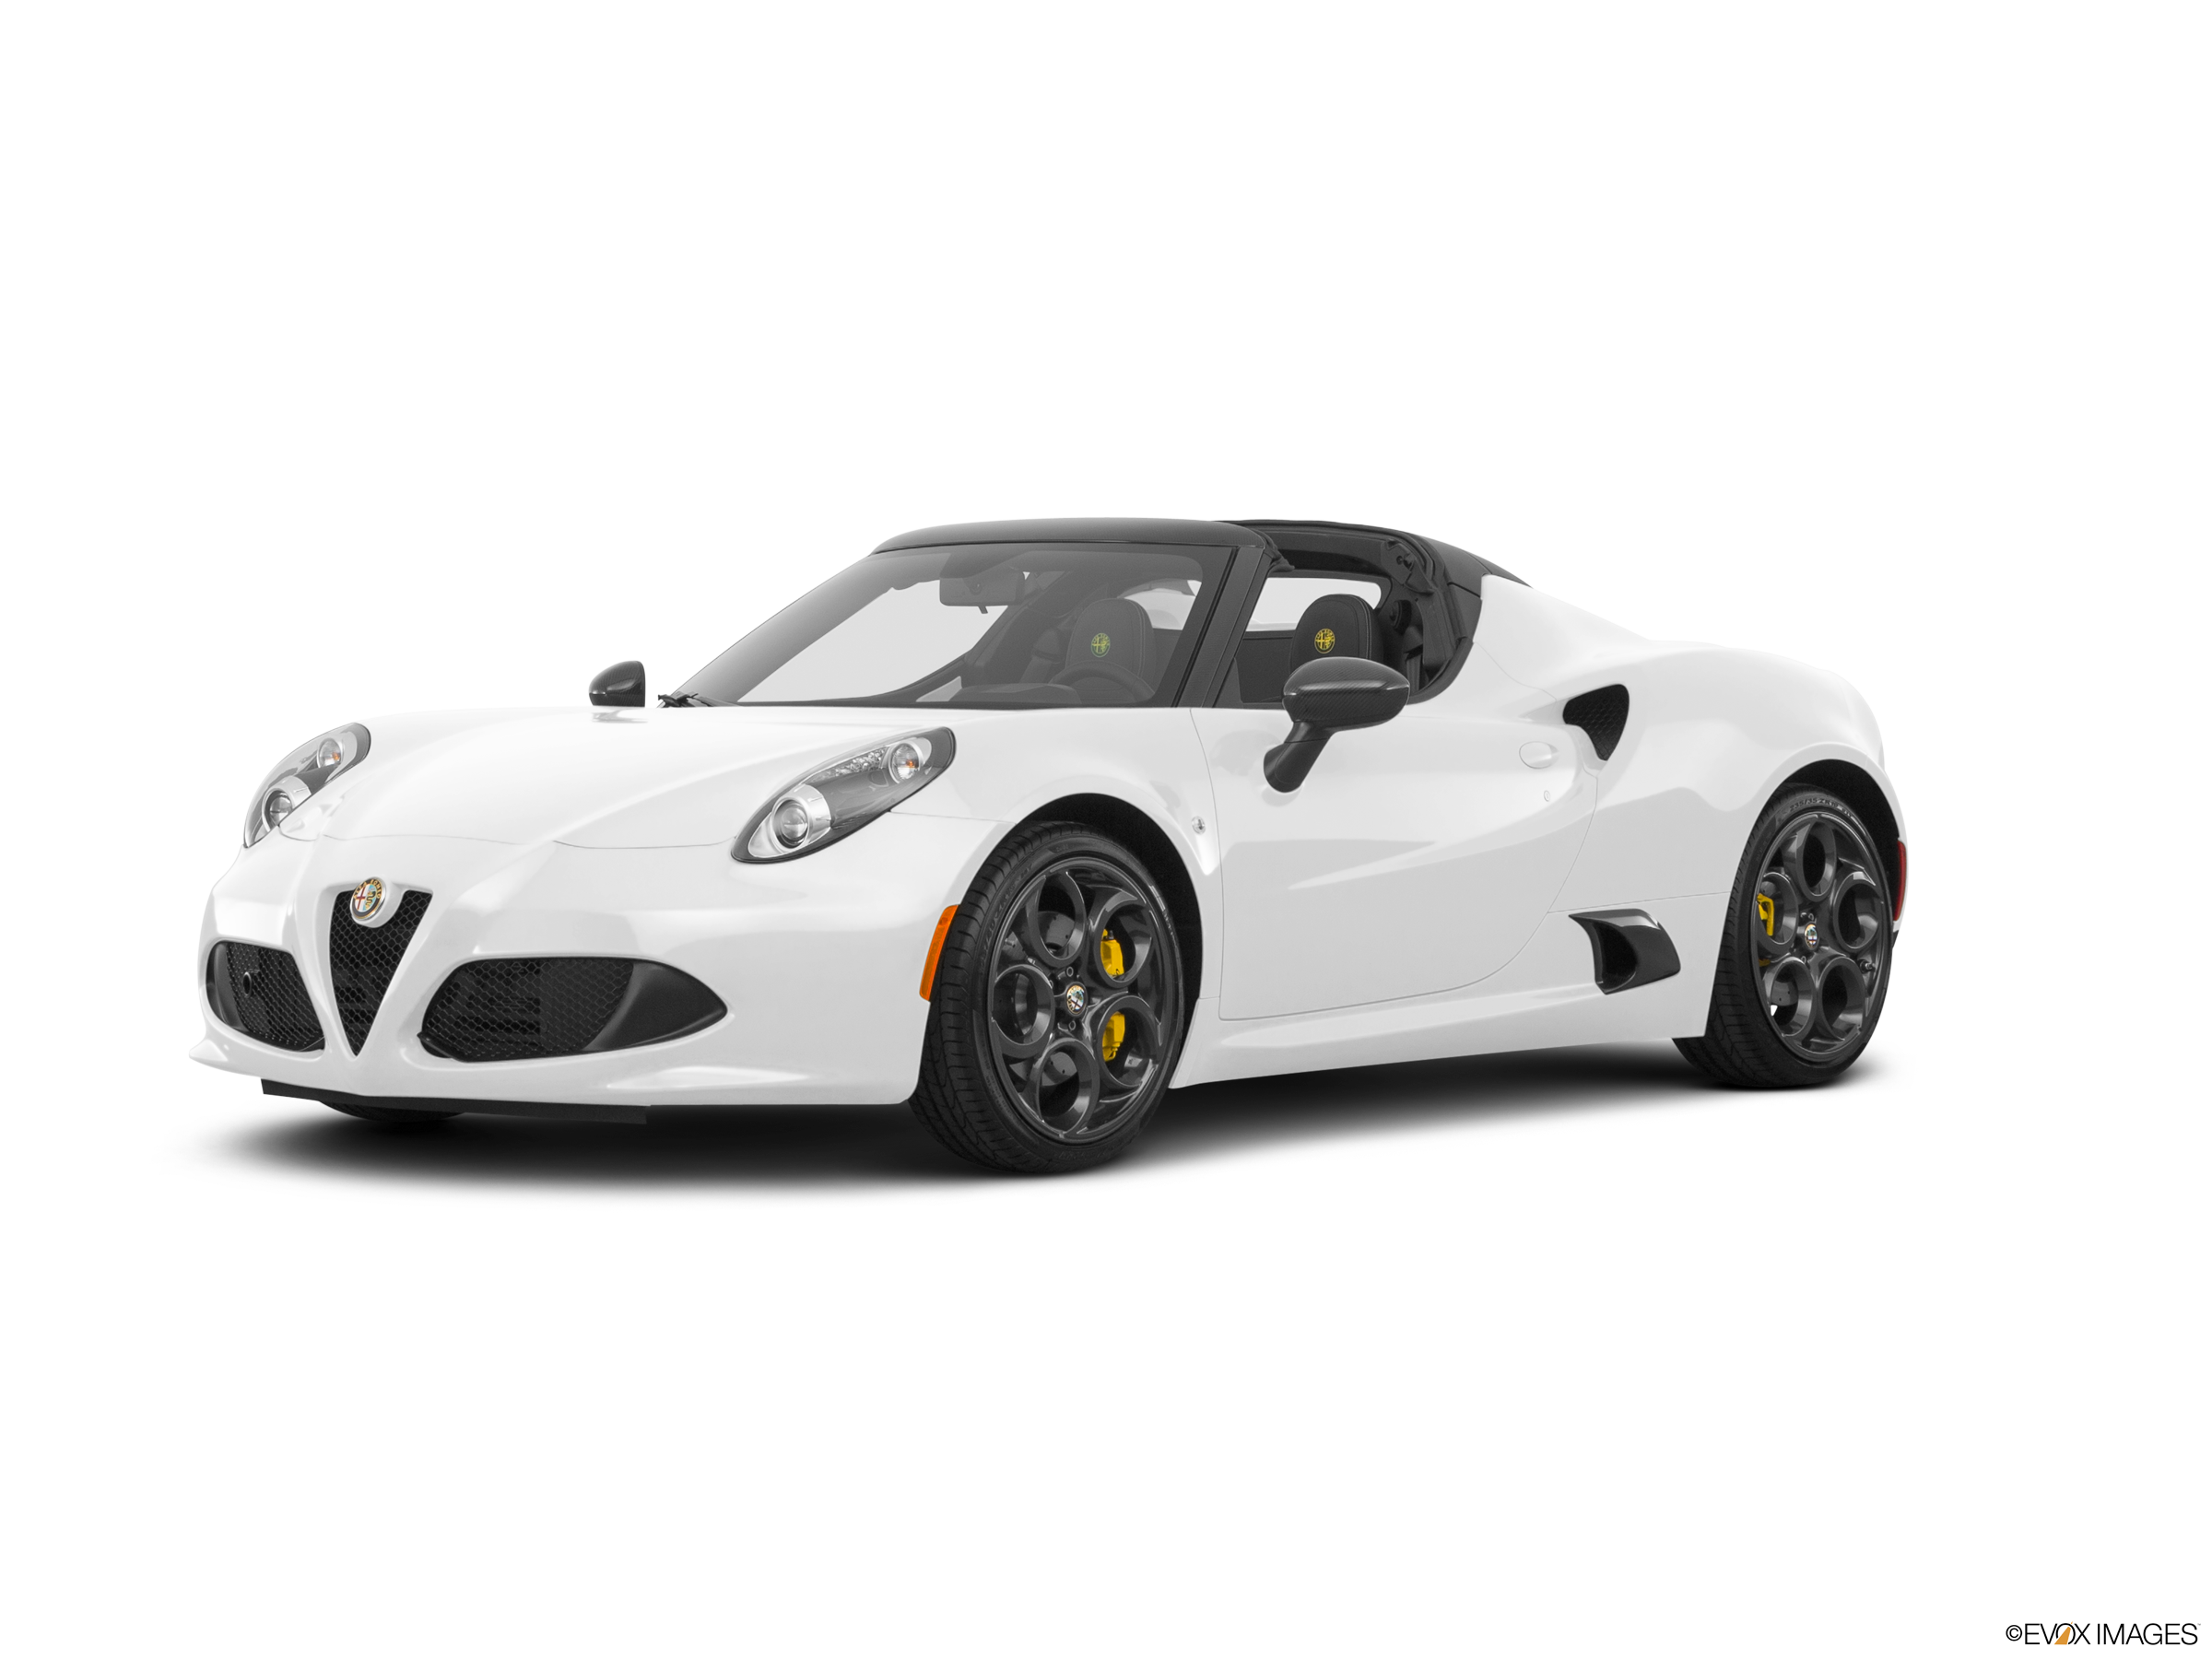 2016 Alfa Romeo 4c Spider Values Cars For Sale Kelley Blue Book